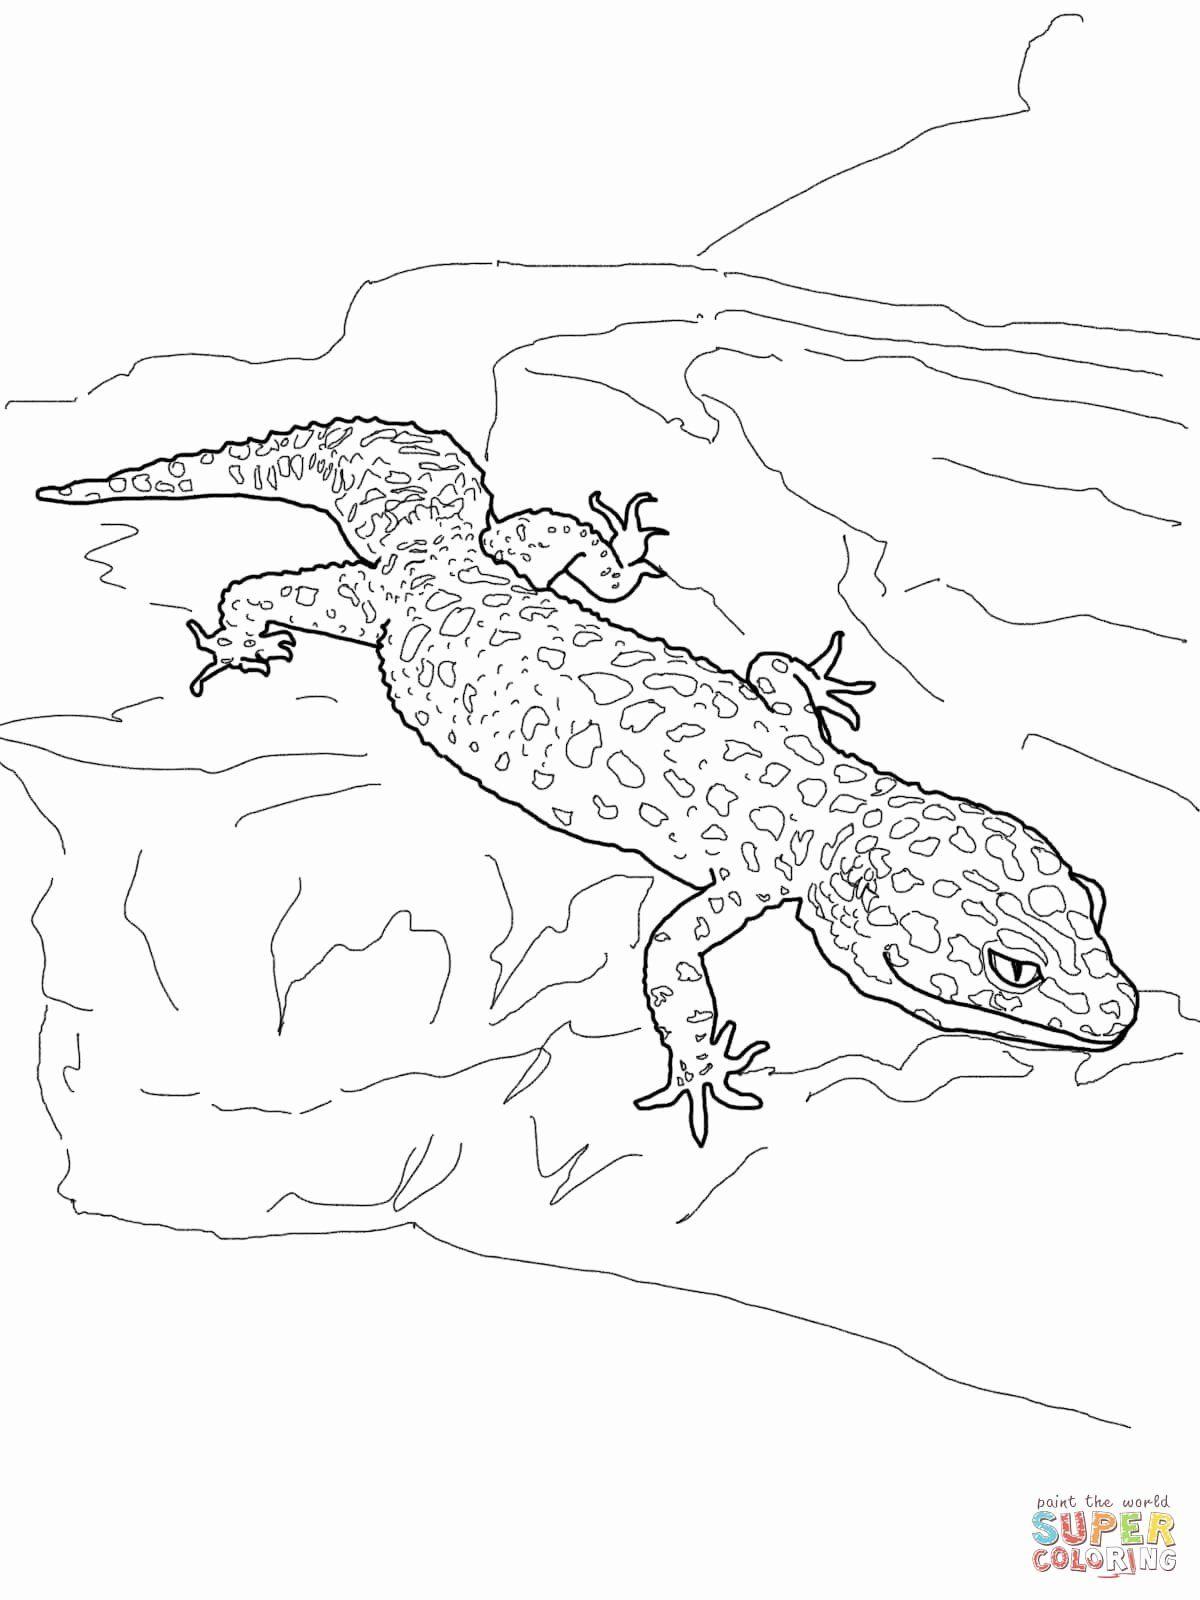 Coloring Cartoon Lizard in 2020 Cartoon lizard, Coloring